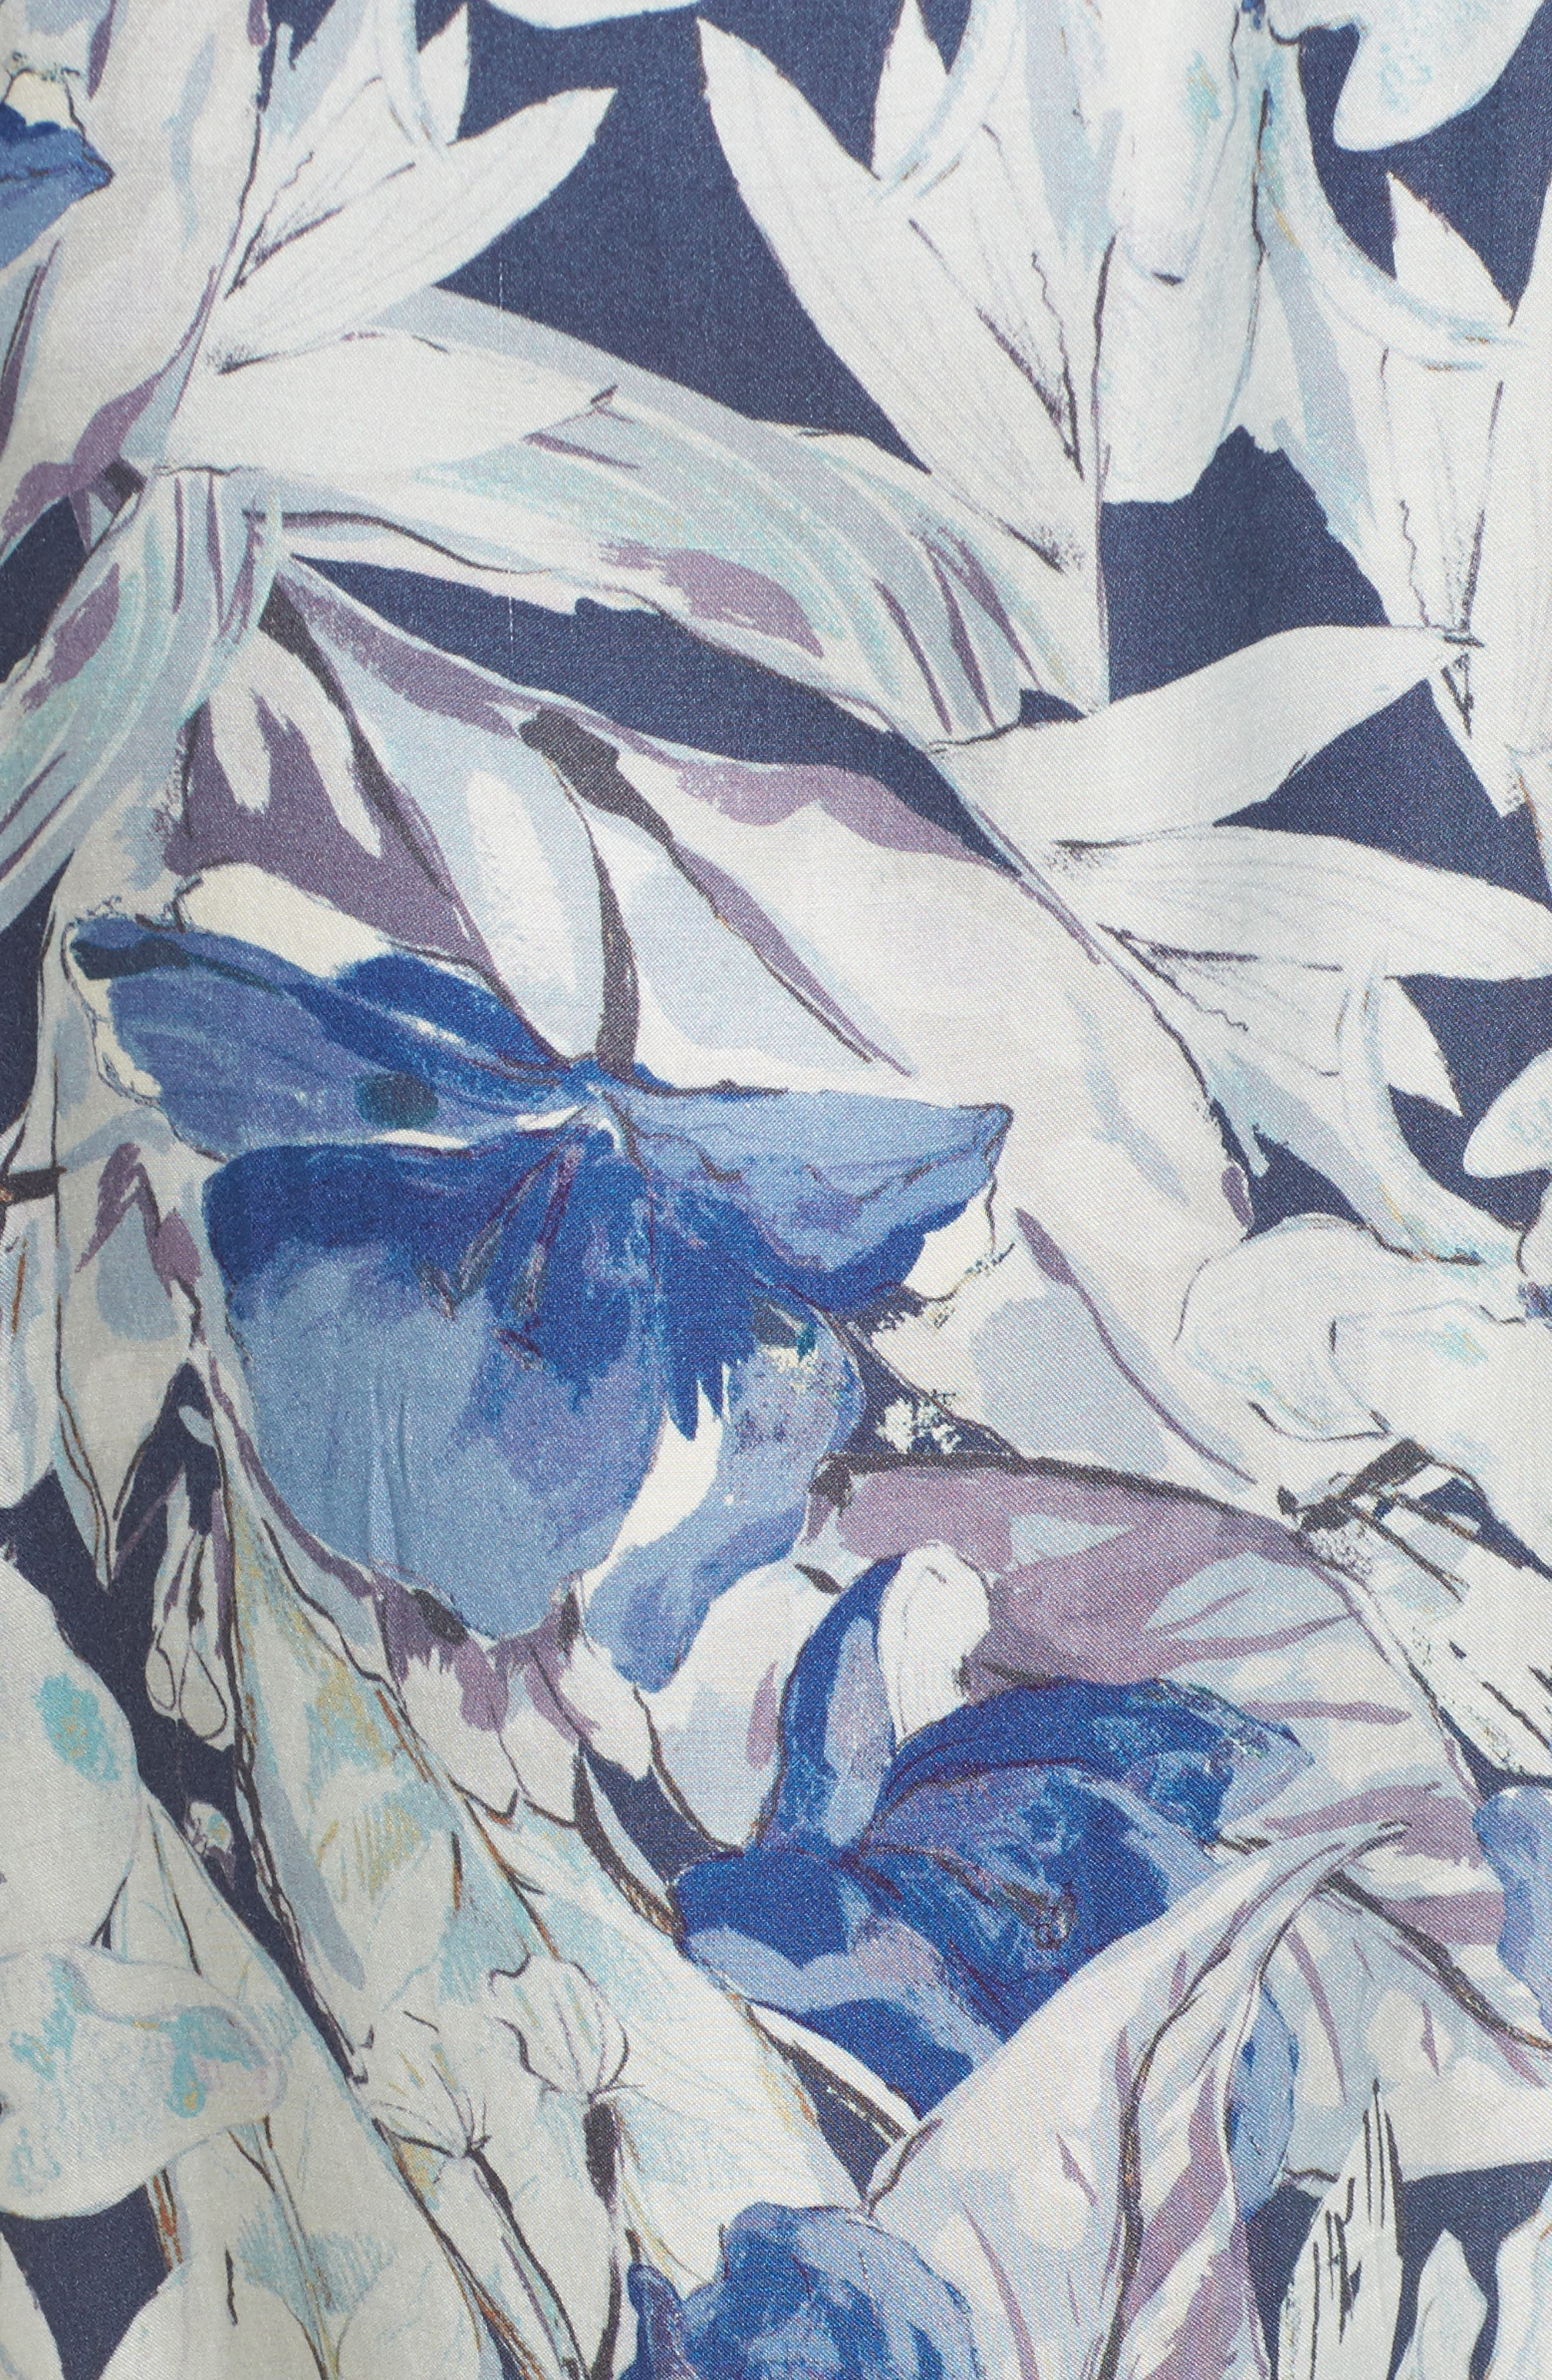 Drucilla Floral Print Duster,                             Alternate thumbnail 6, color,                             400